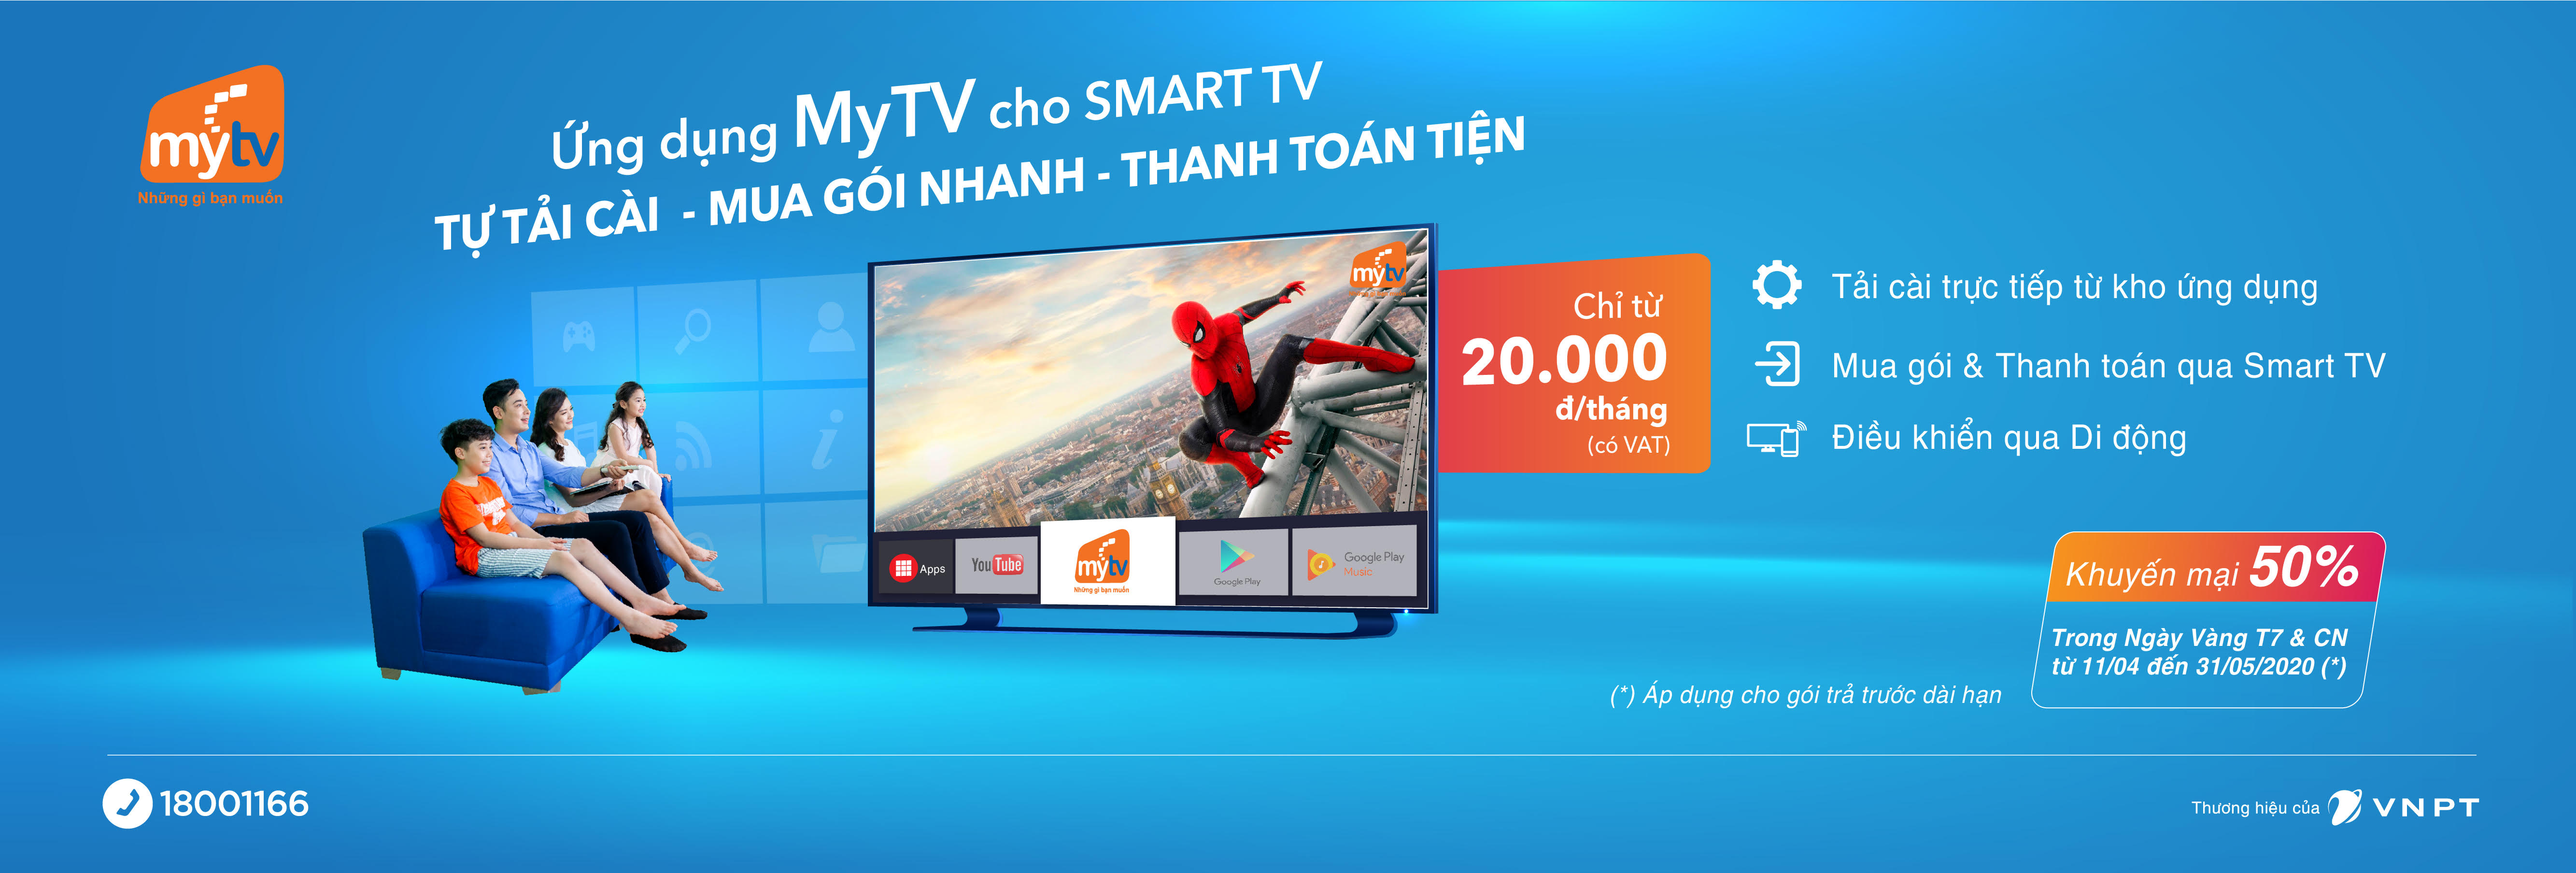 ứng dụng MYTV Cho smart TV